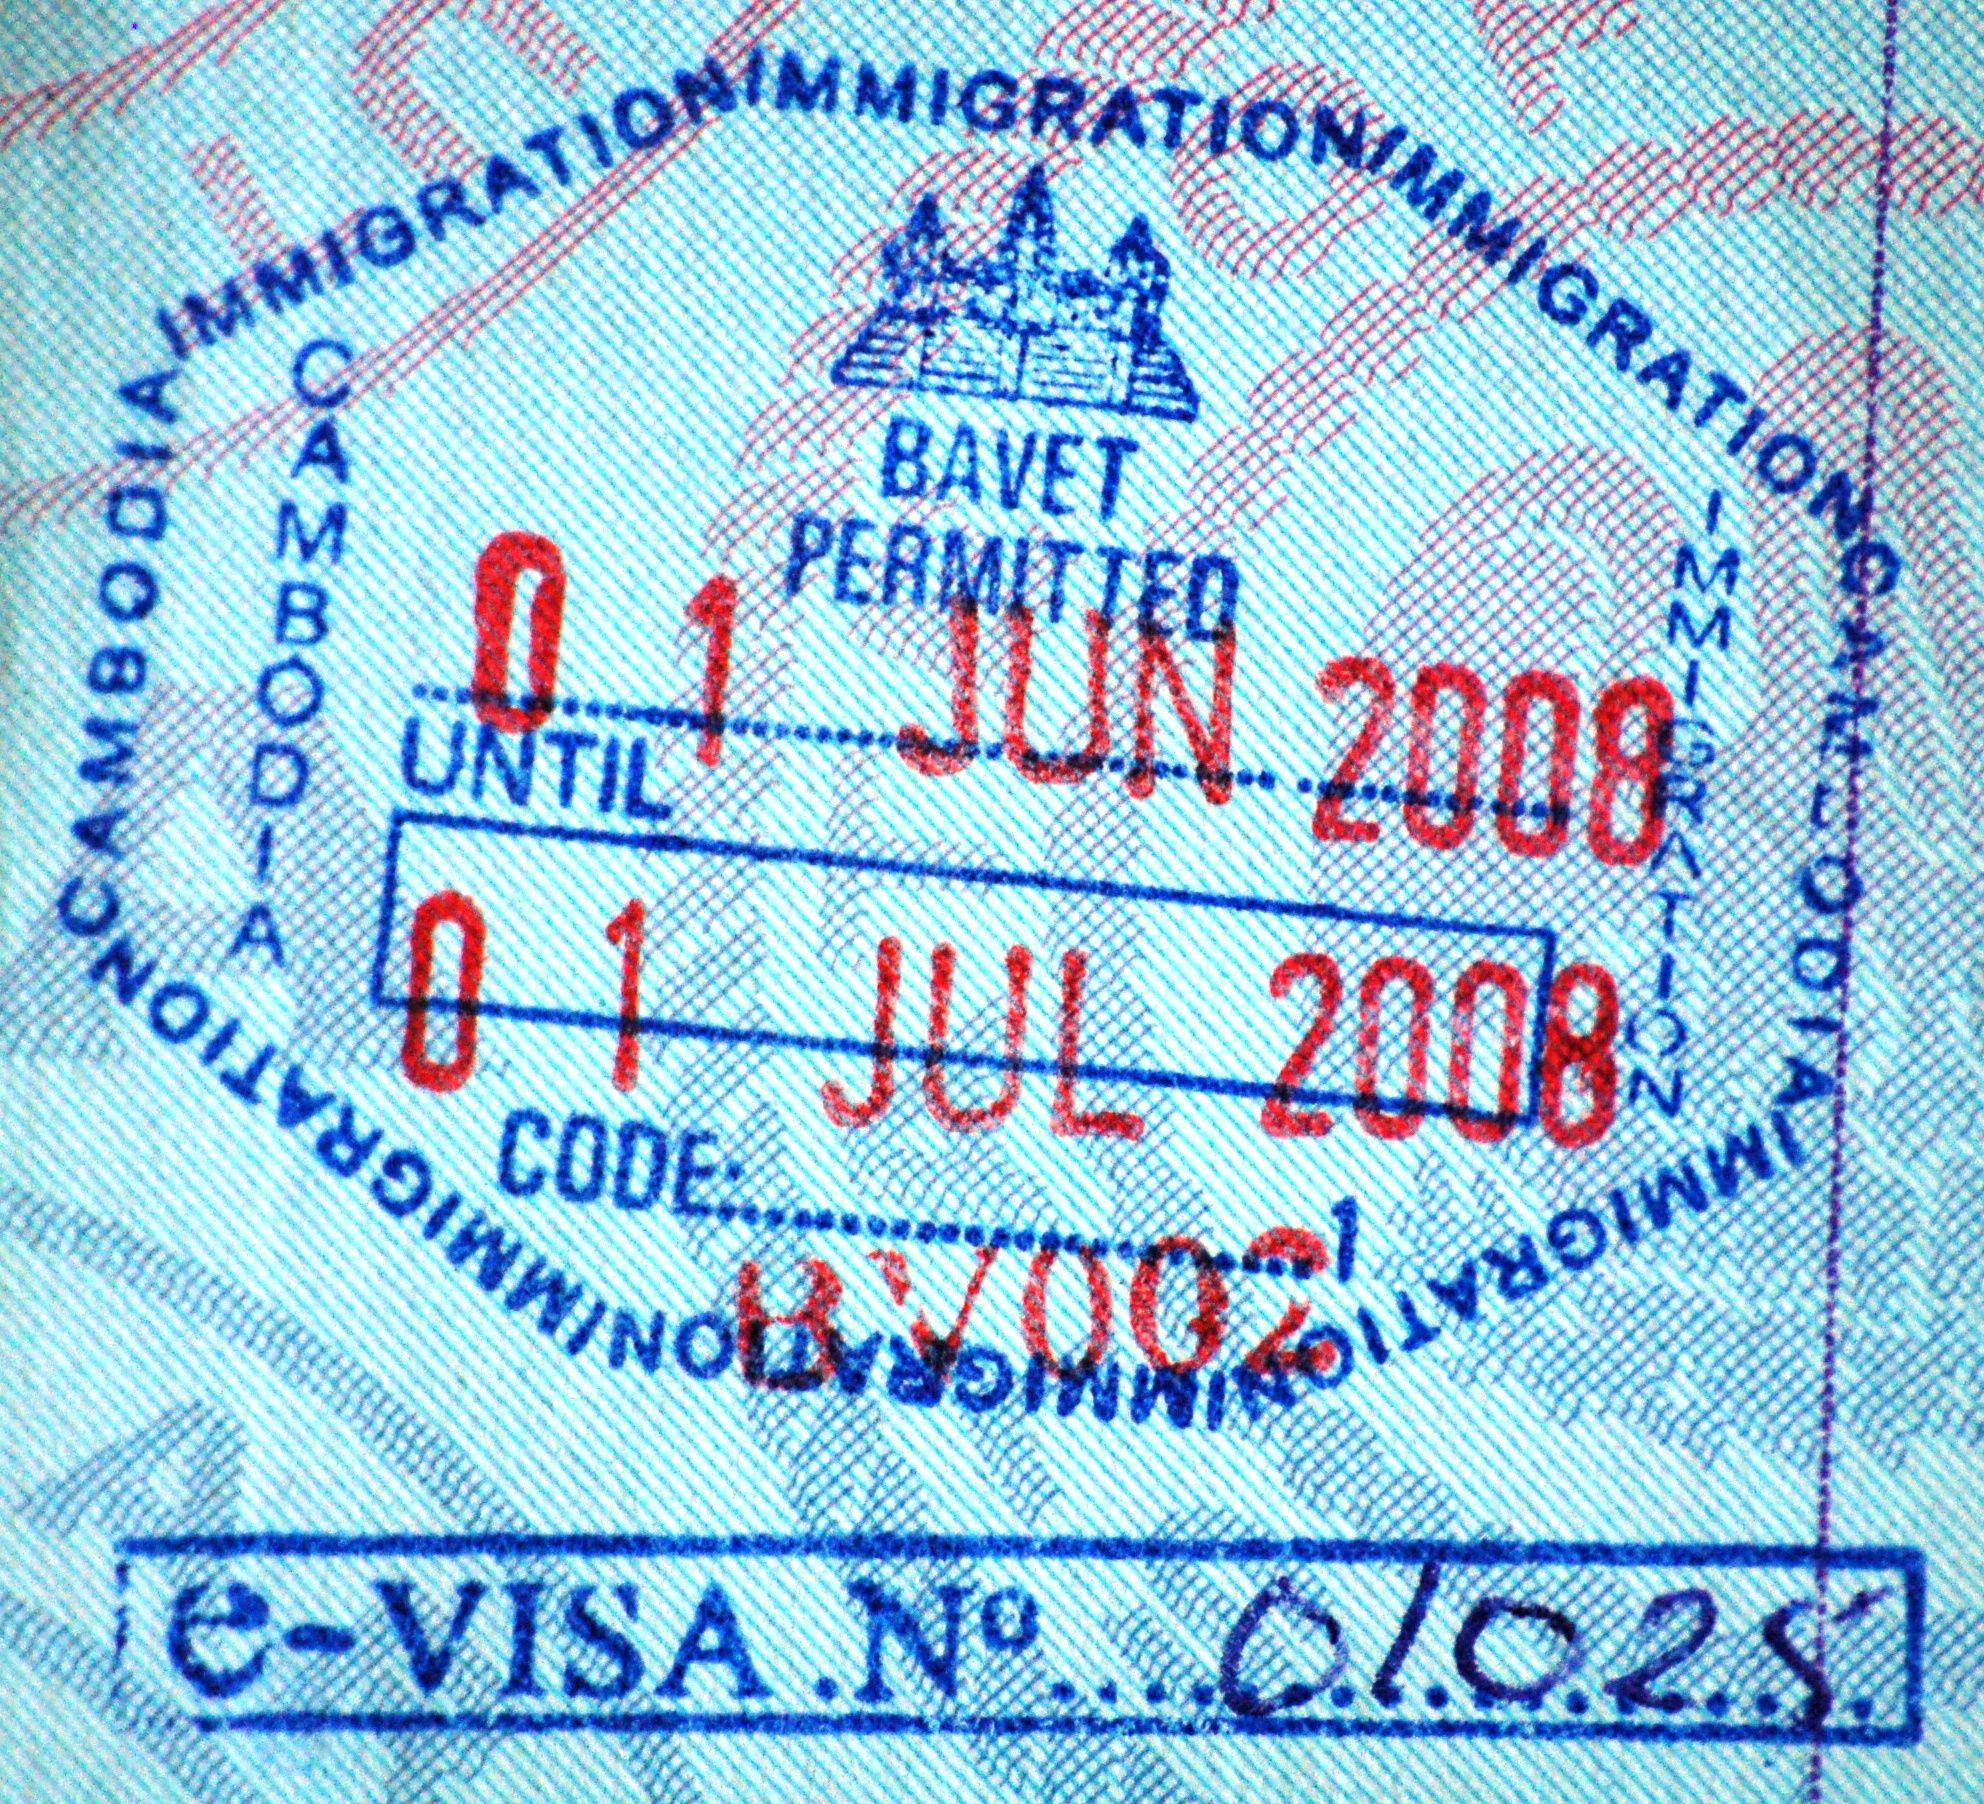 Cambodia visa stamp - note Cambodia e-Visa number at bottom.